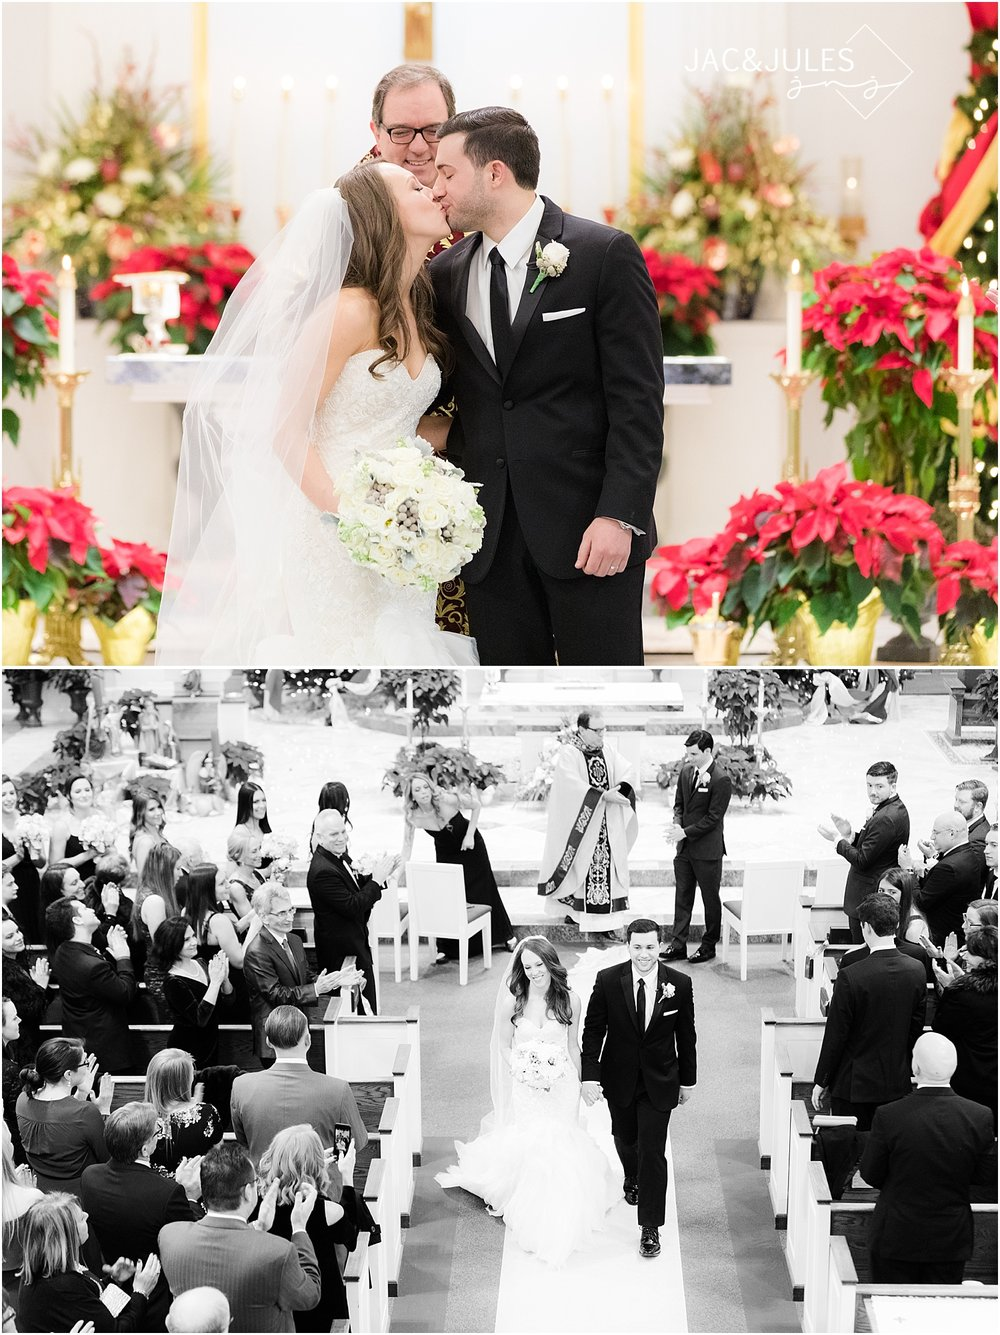 beautiful wedding ceremony at christmas at st. philomena church in livingston nj